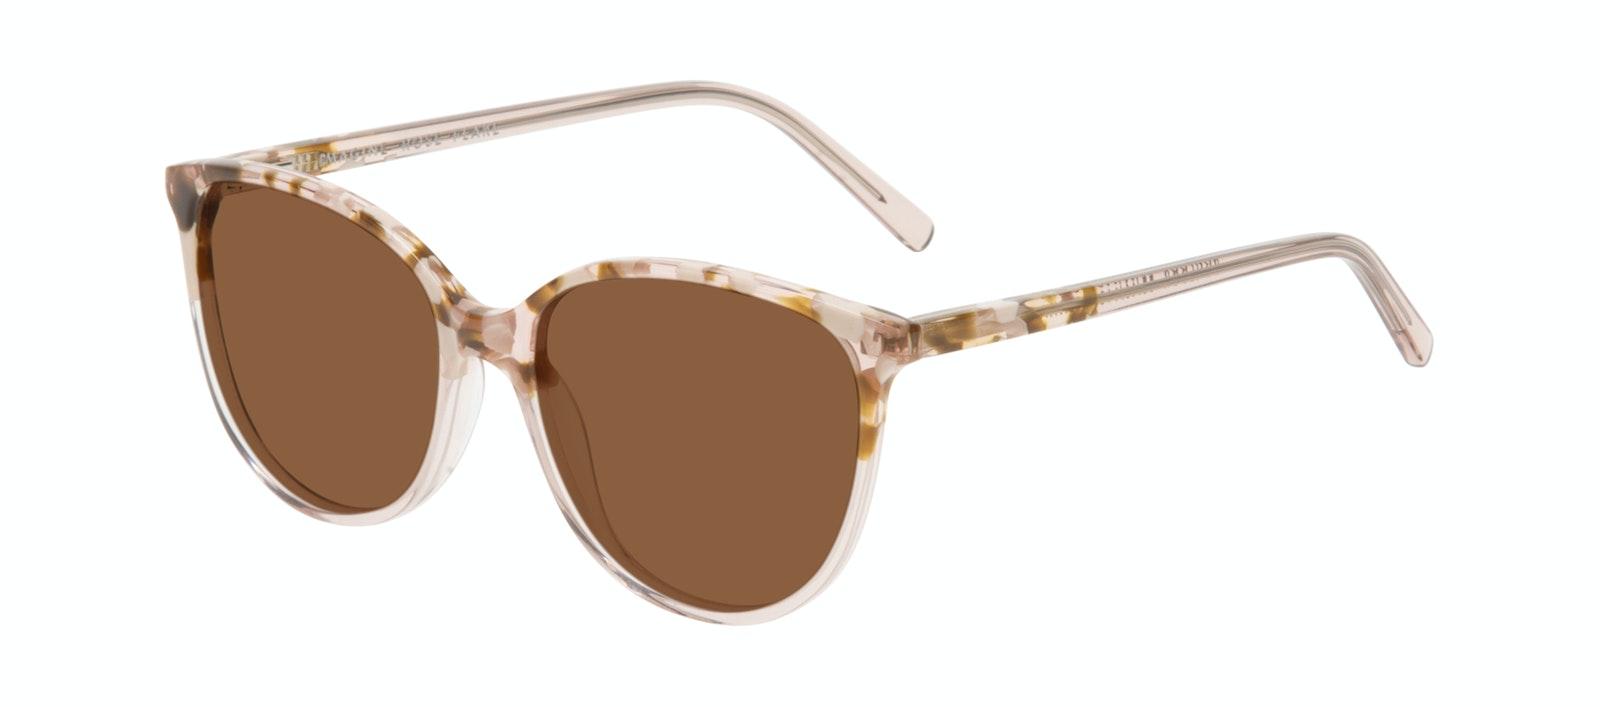 Affordable Fashion Glasses Cat Eye Sunglasses Women Imagine Rose Flake Tilt